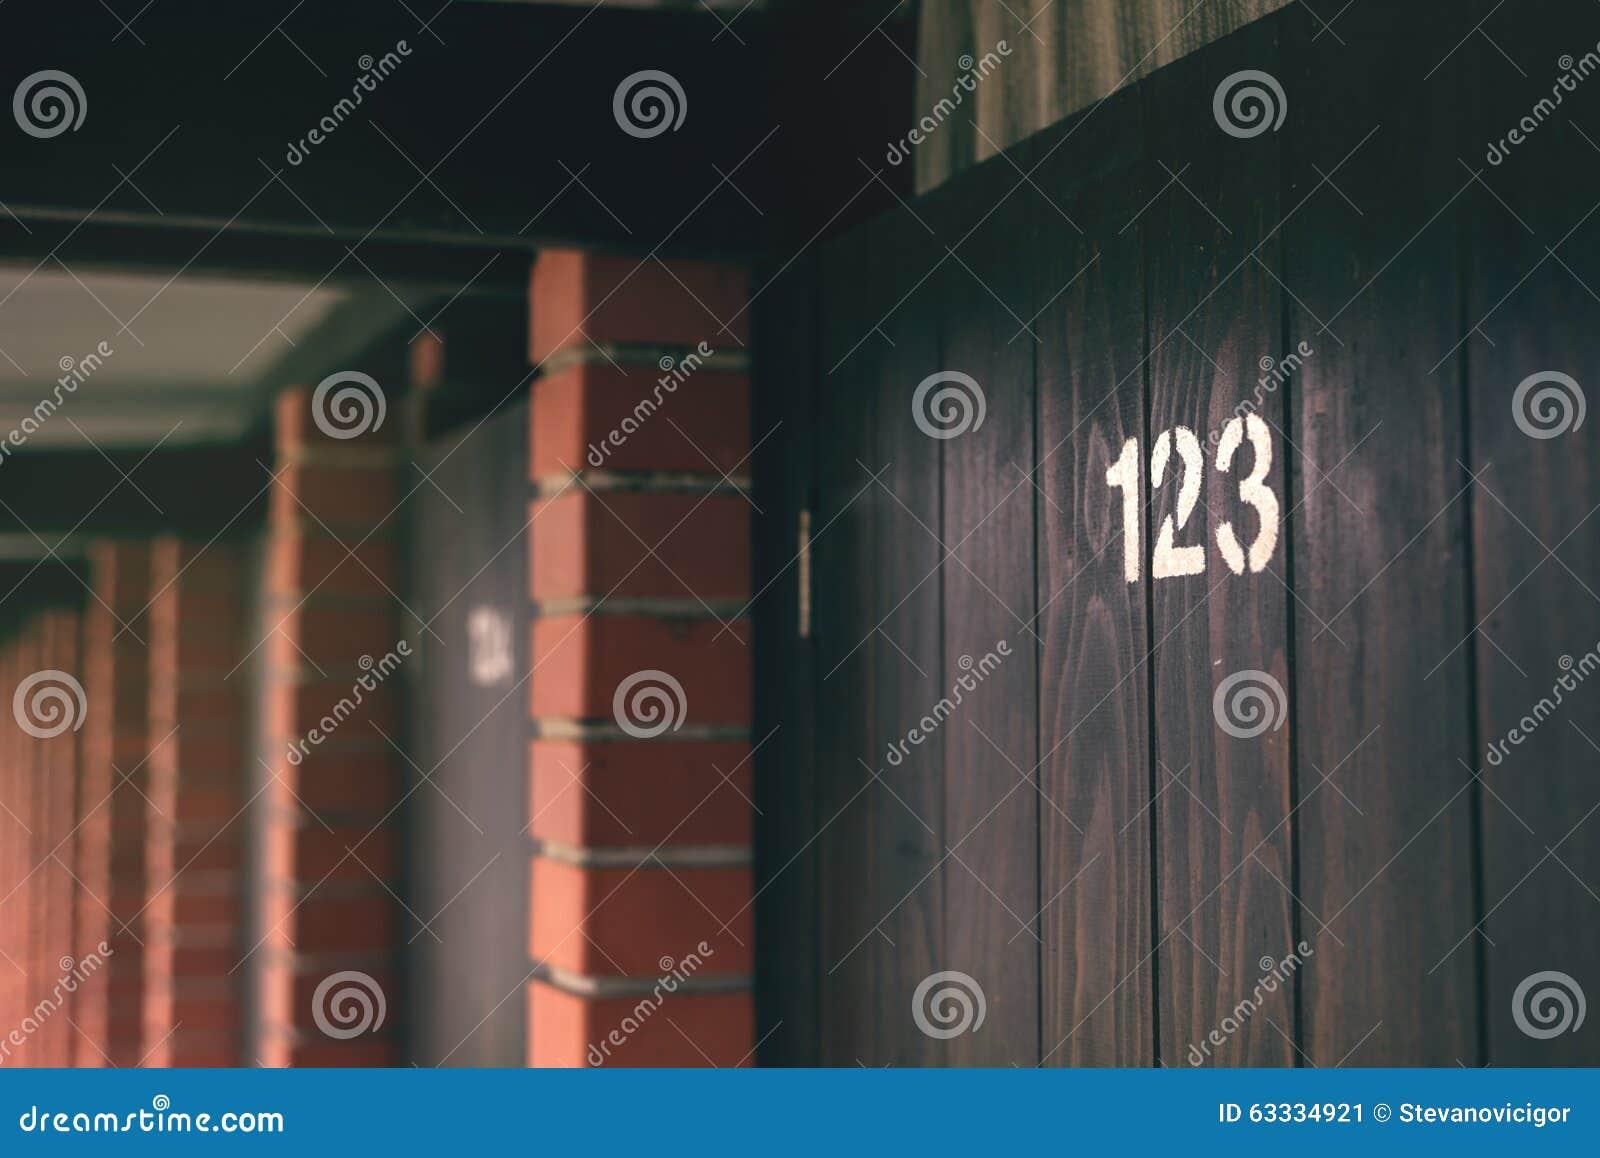 Beach cabin door number 123 stock photo image 63334921 for 123 cabins